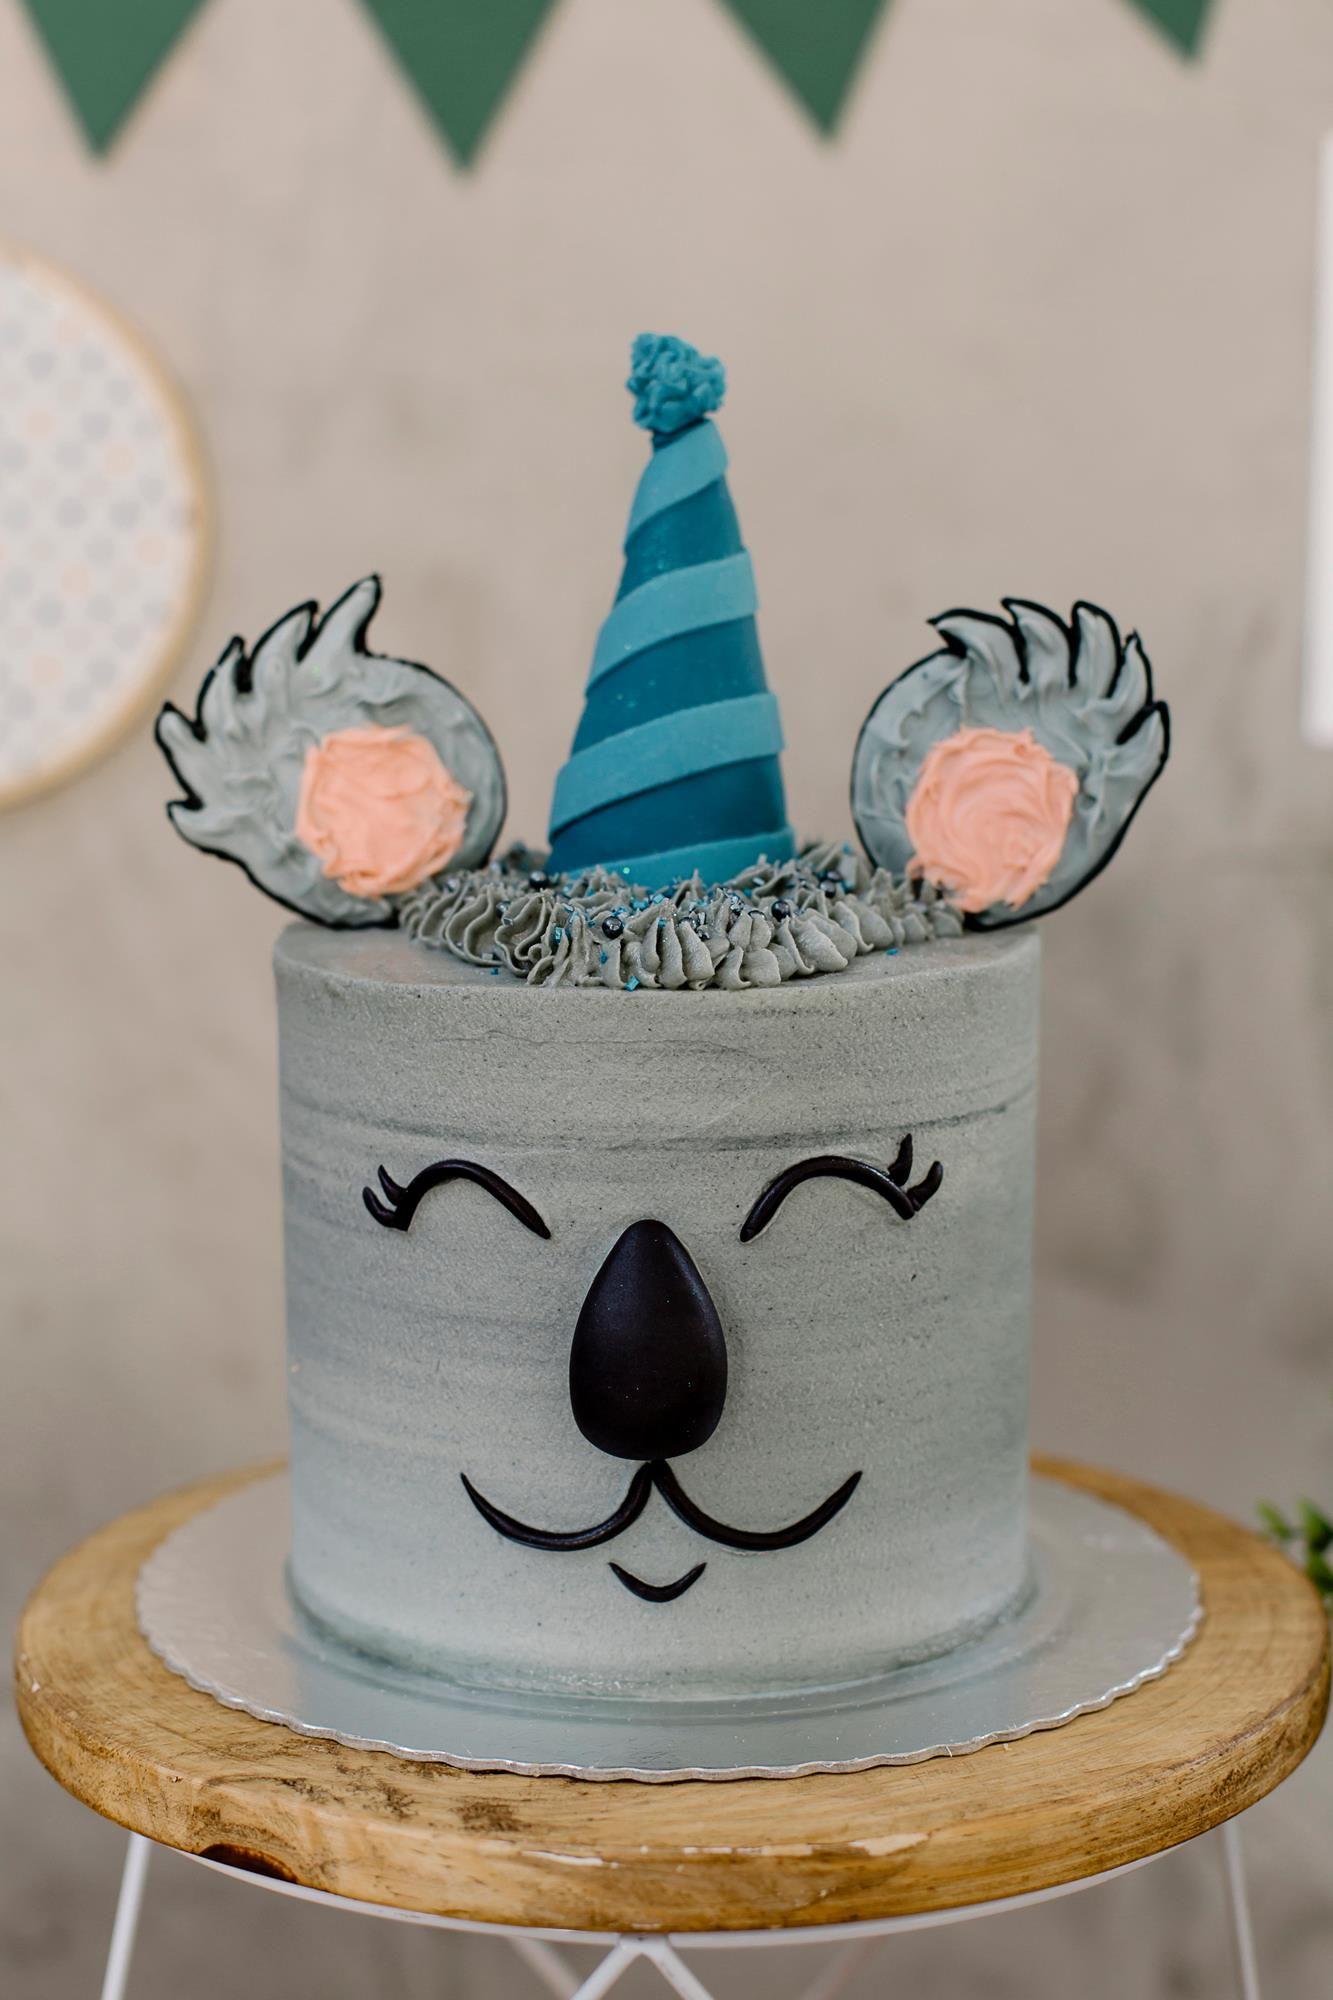 Camila Poli bolo de buttercream maravilhosocamila poli, inspirado na